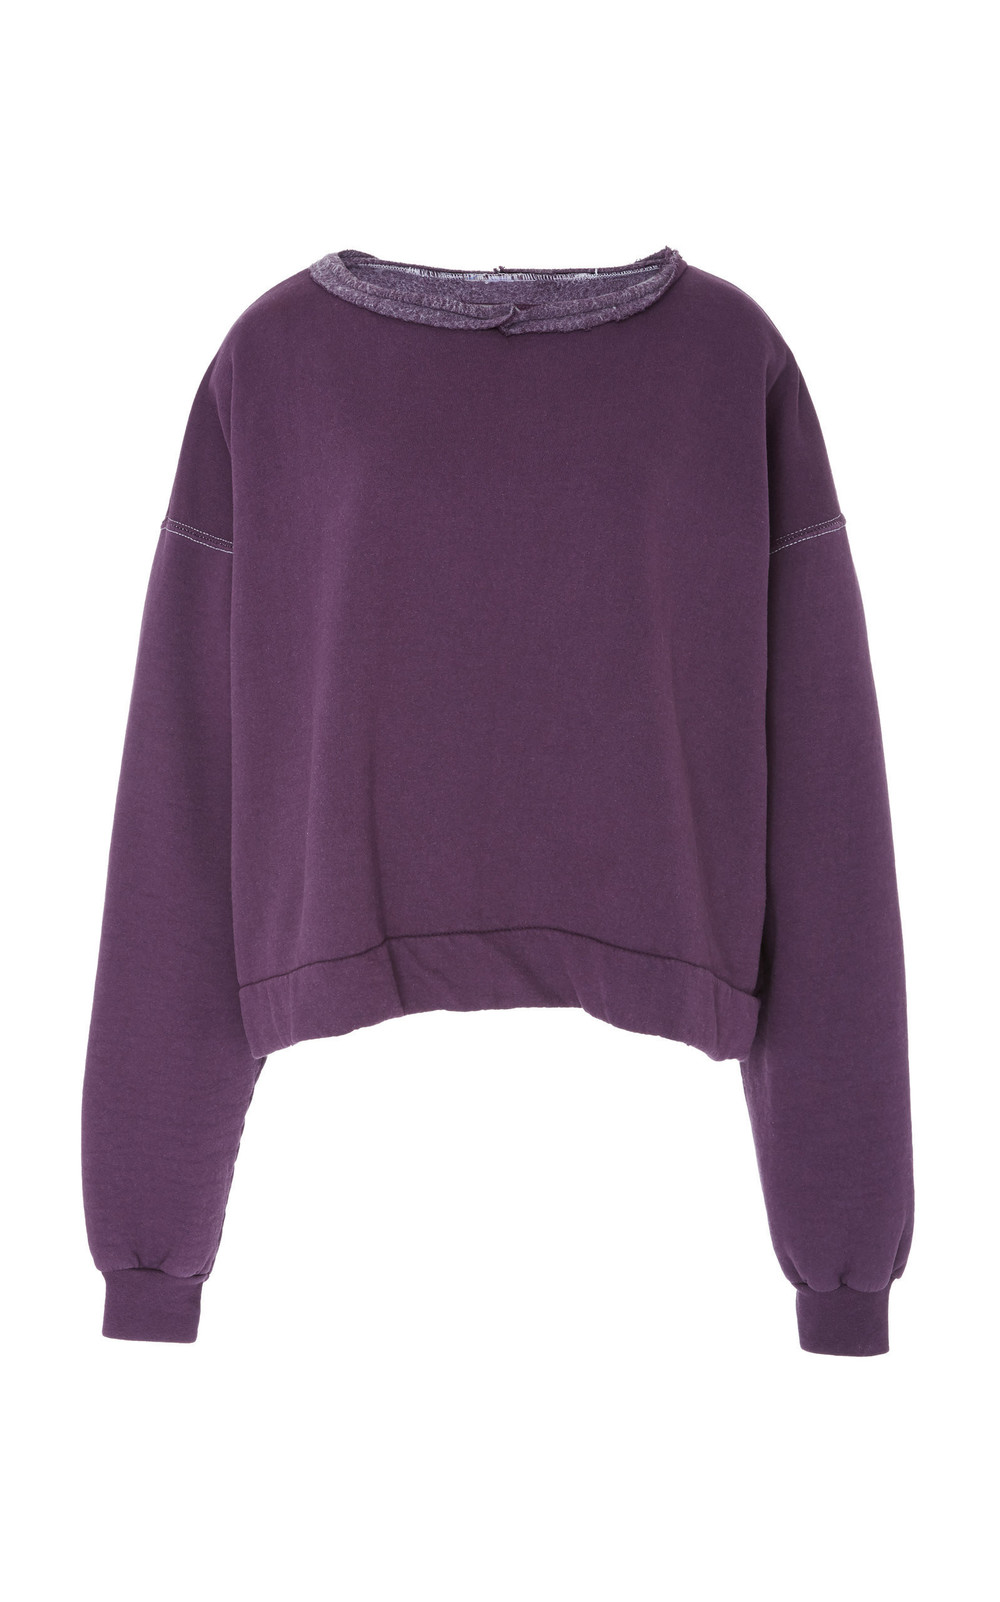 Rachel Comey Mingle Cotton Blend Sweatshirt in purple